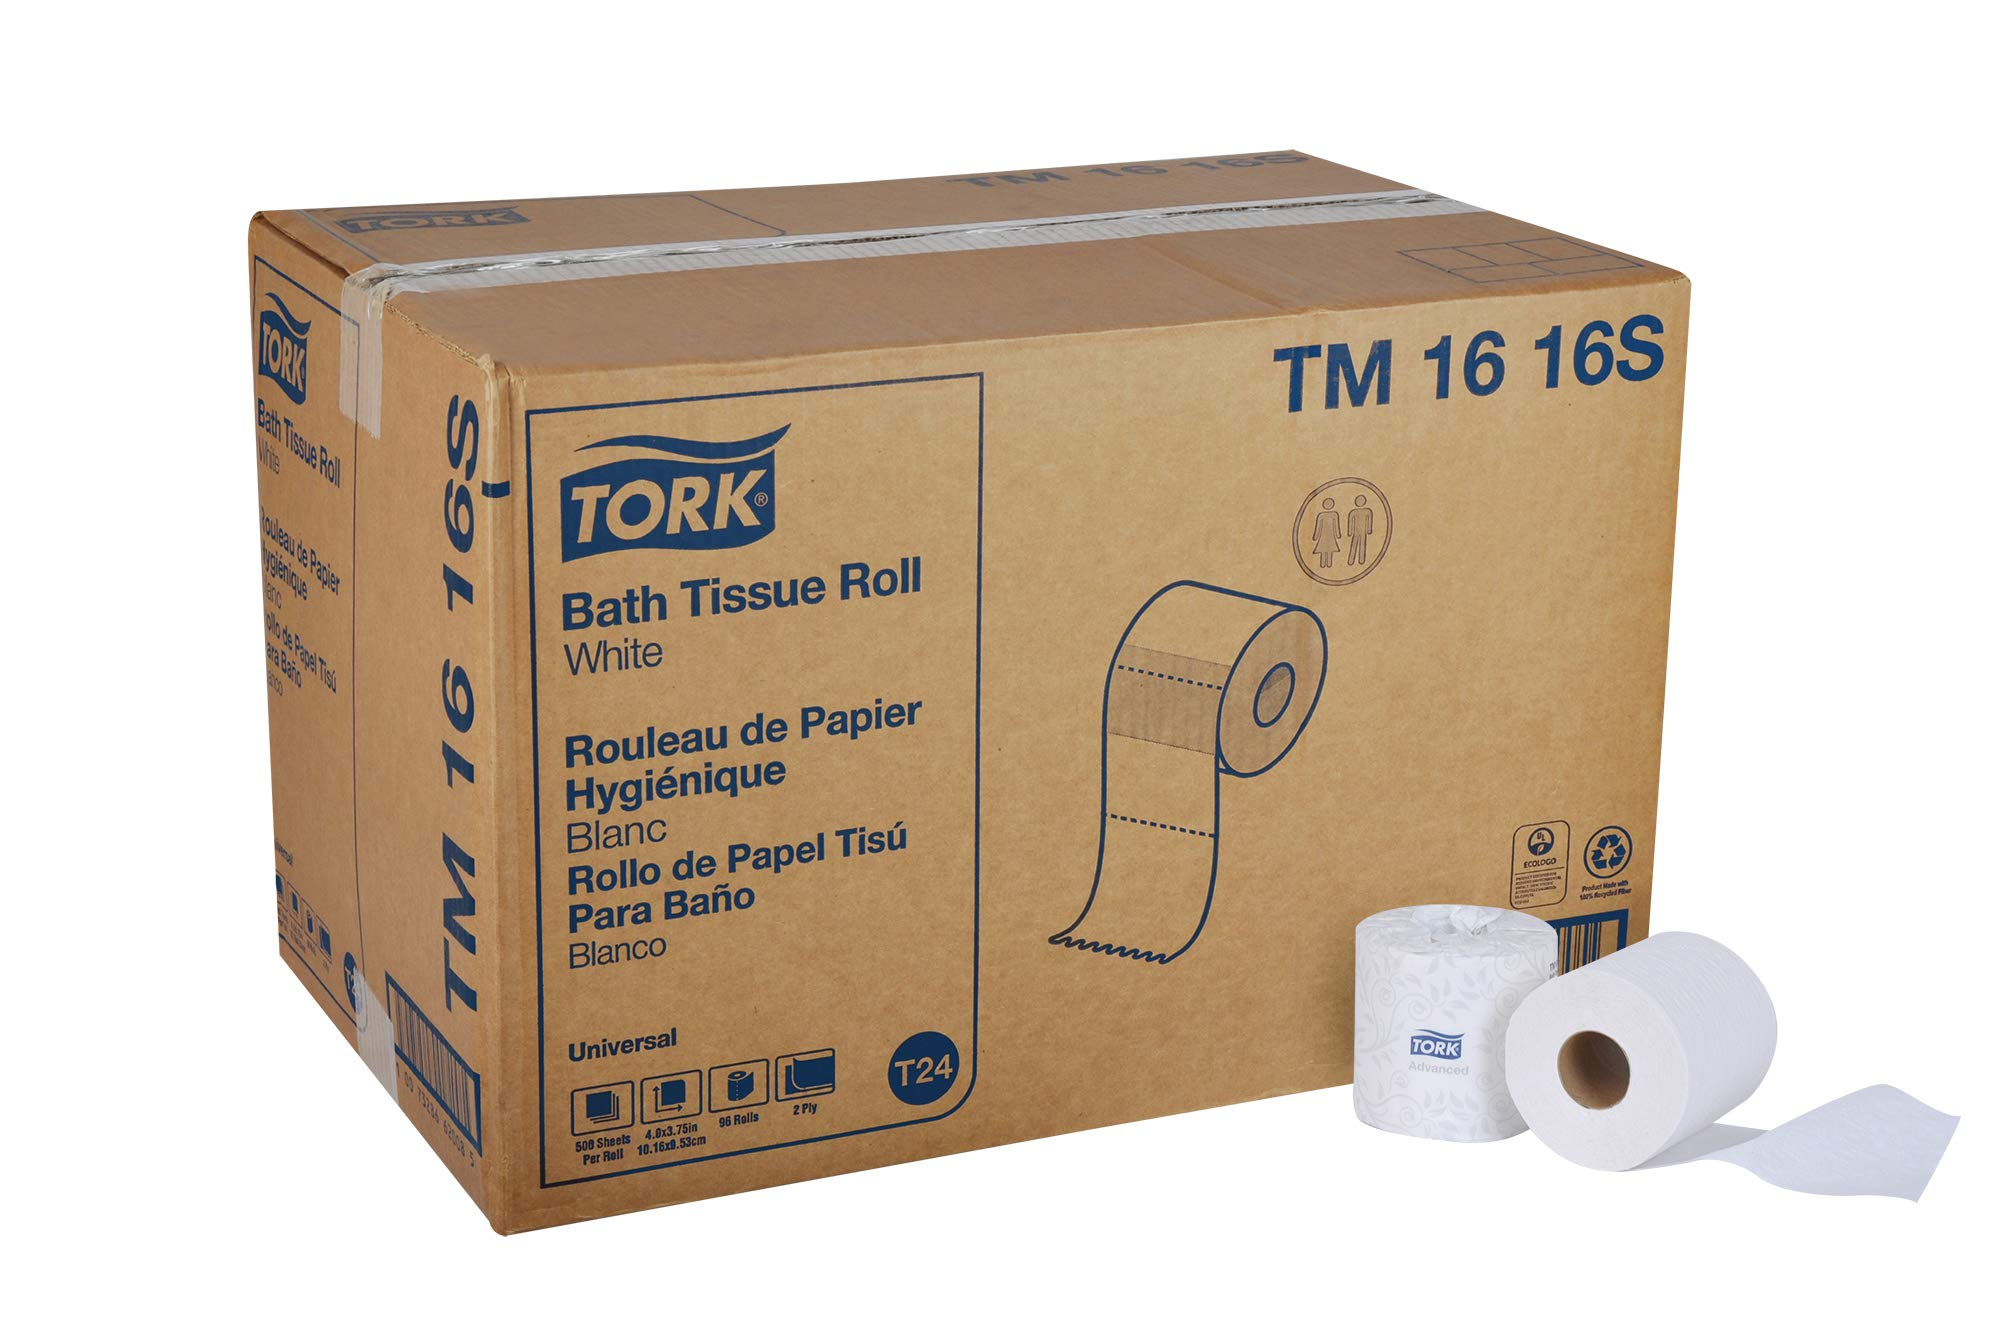 "Tork Universal TM1616S Bath Tissue Roll, 2-Ply, 4"" Width x 3.75"" Length, White (Case  of 96 Rolls, 500 per Roll, 48,000 Sheets)"